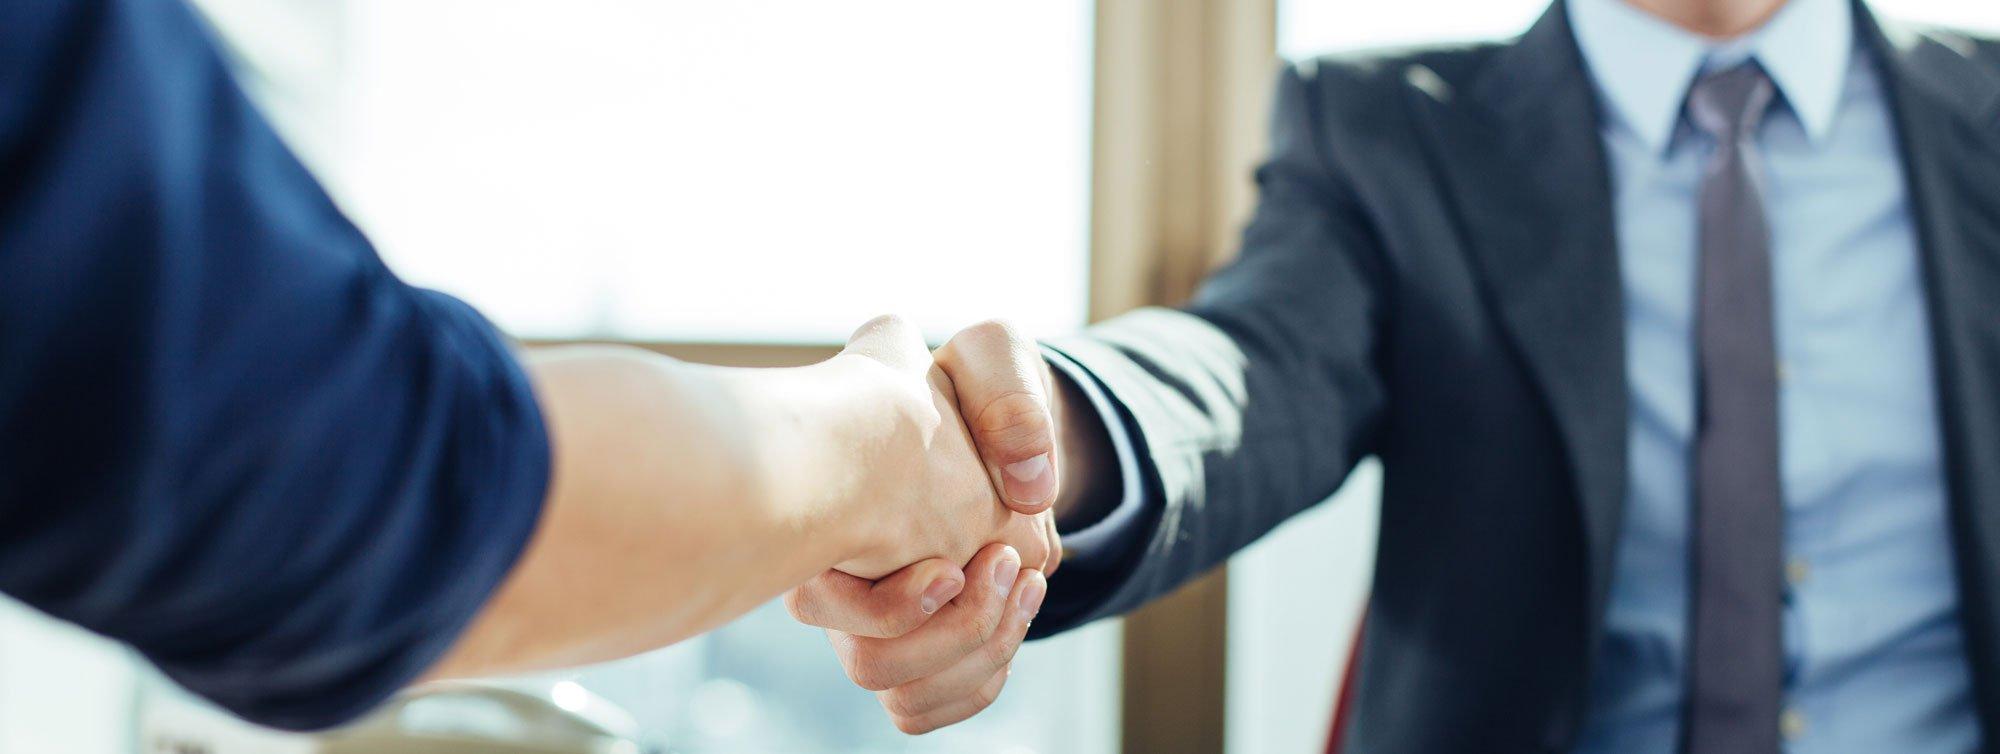 Handshake_Header